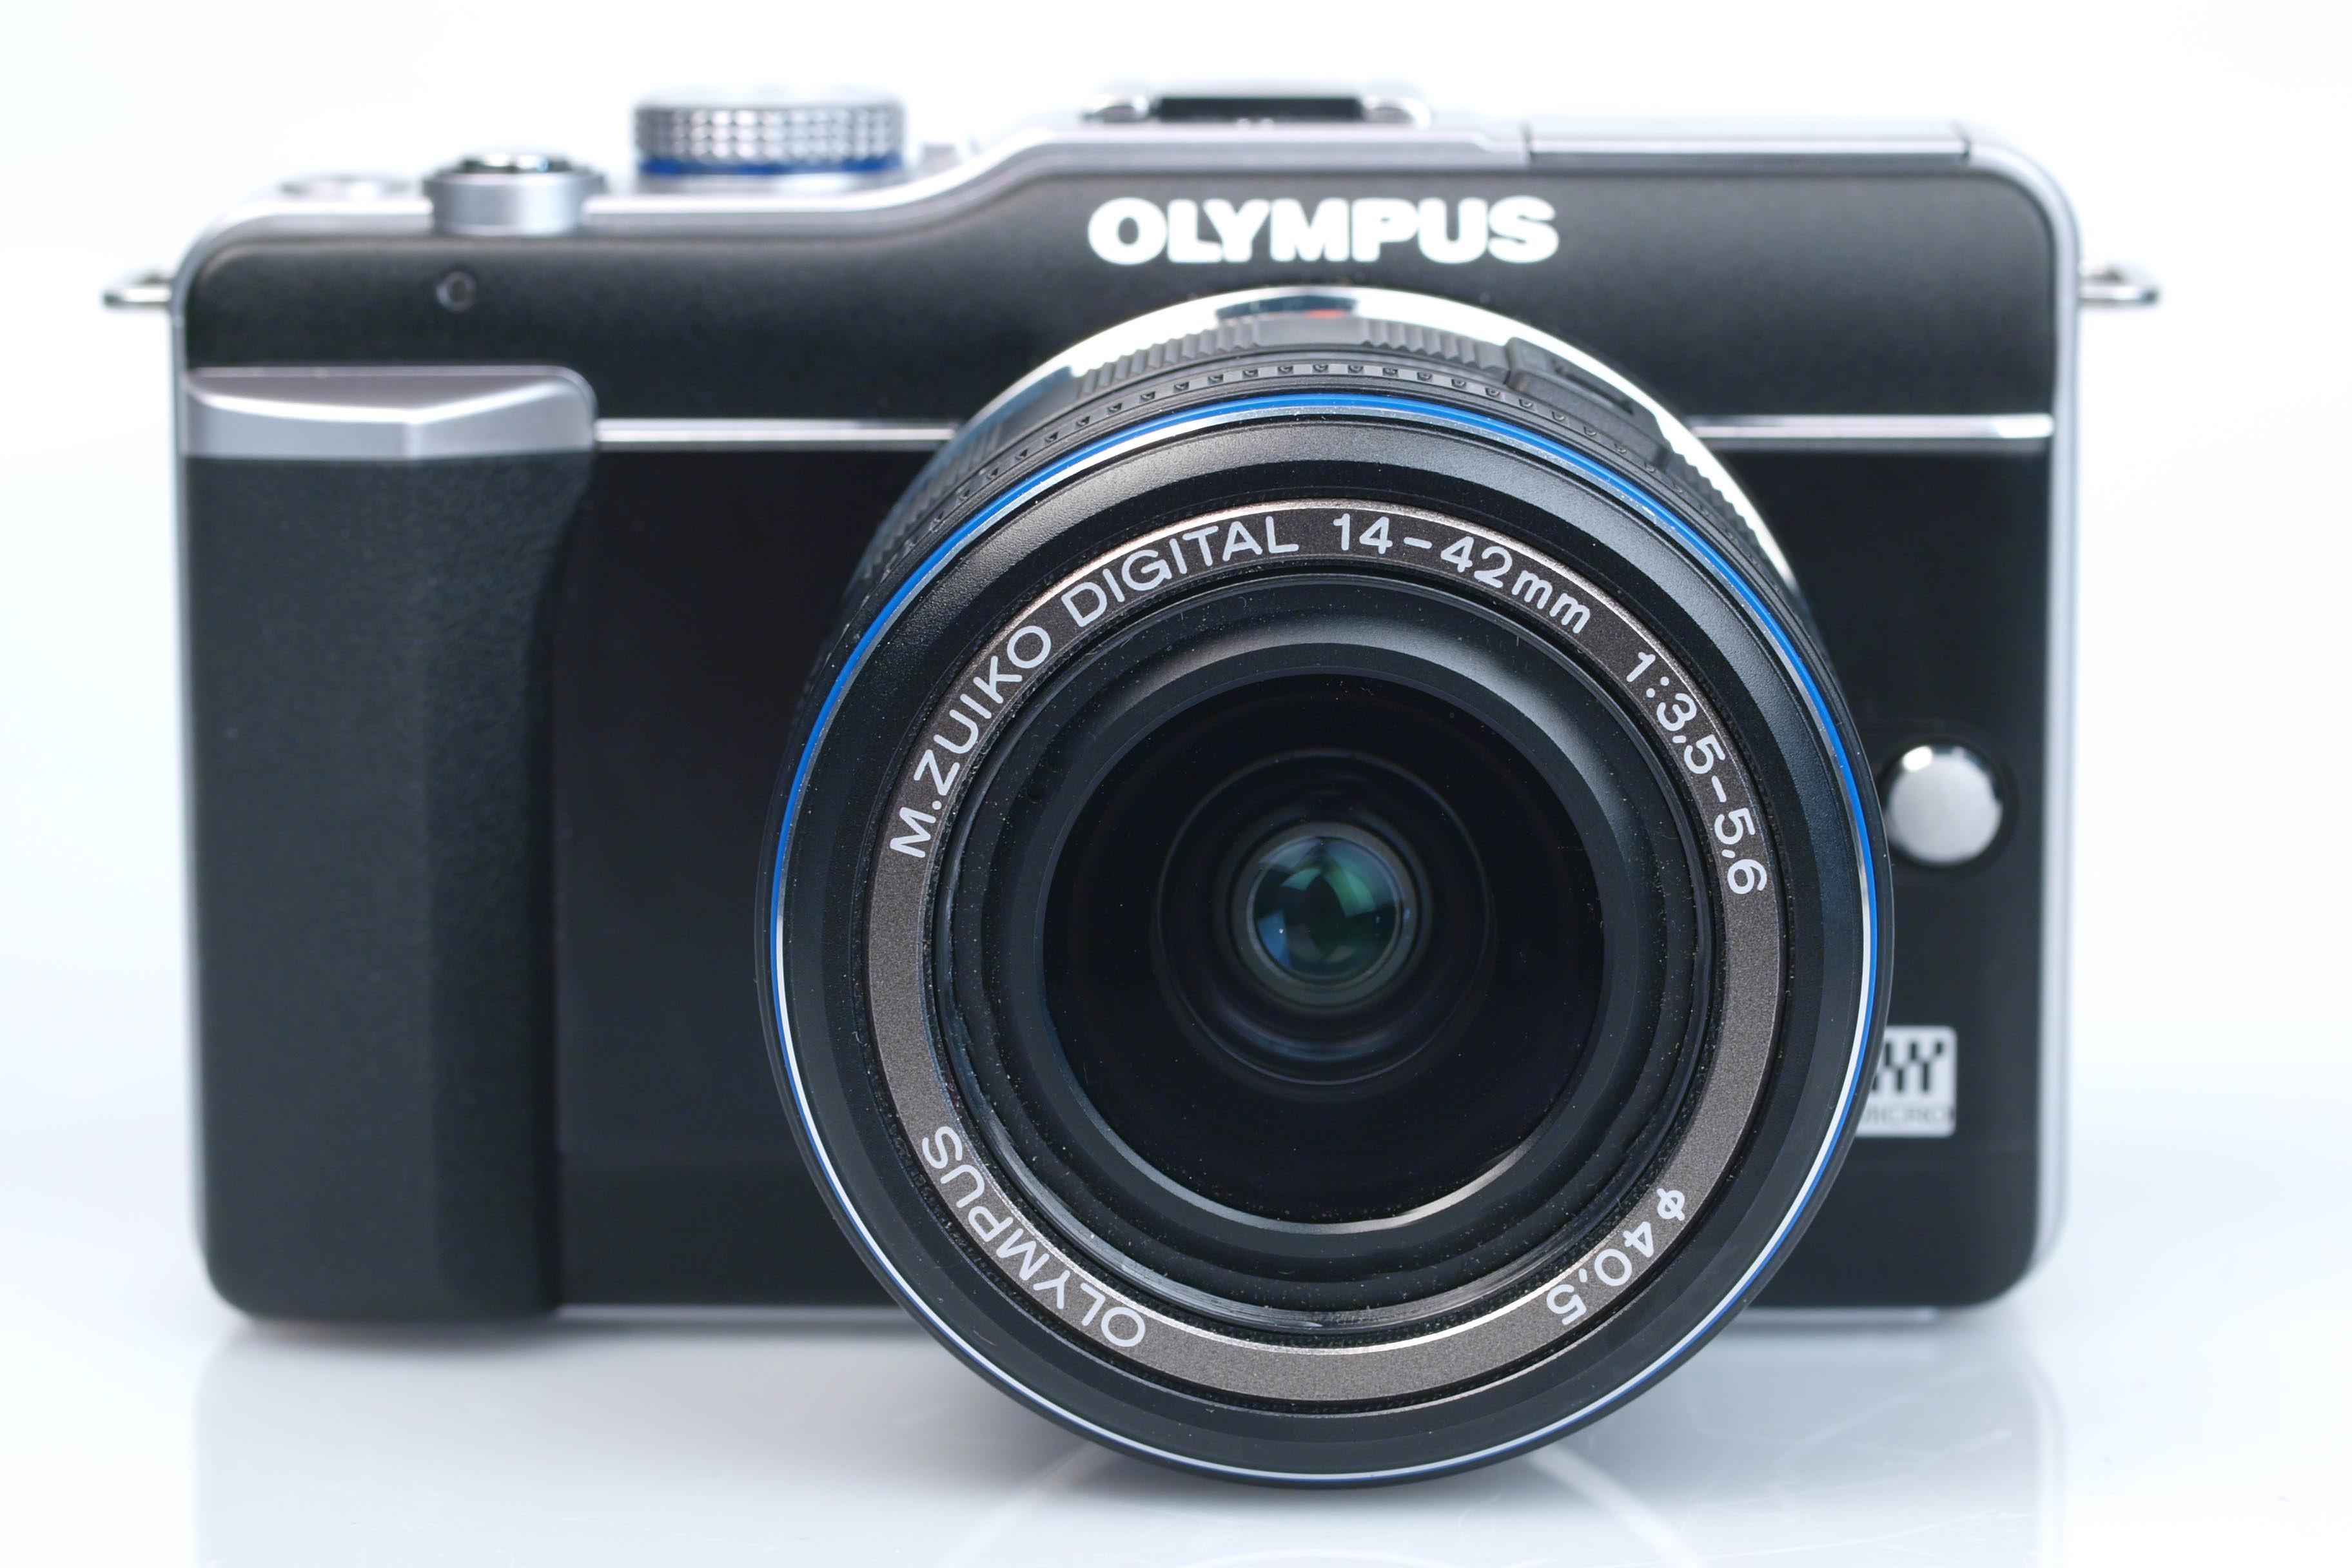 Camera Olympus Dslr Camera Reviews olympus pen e pl1 digital camera review front view